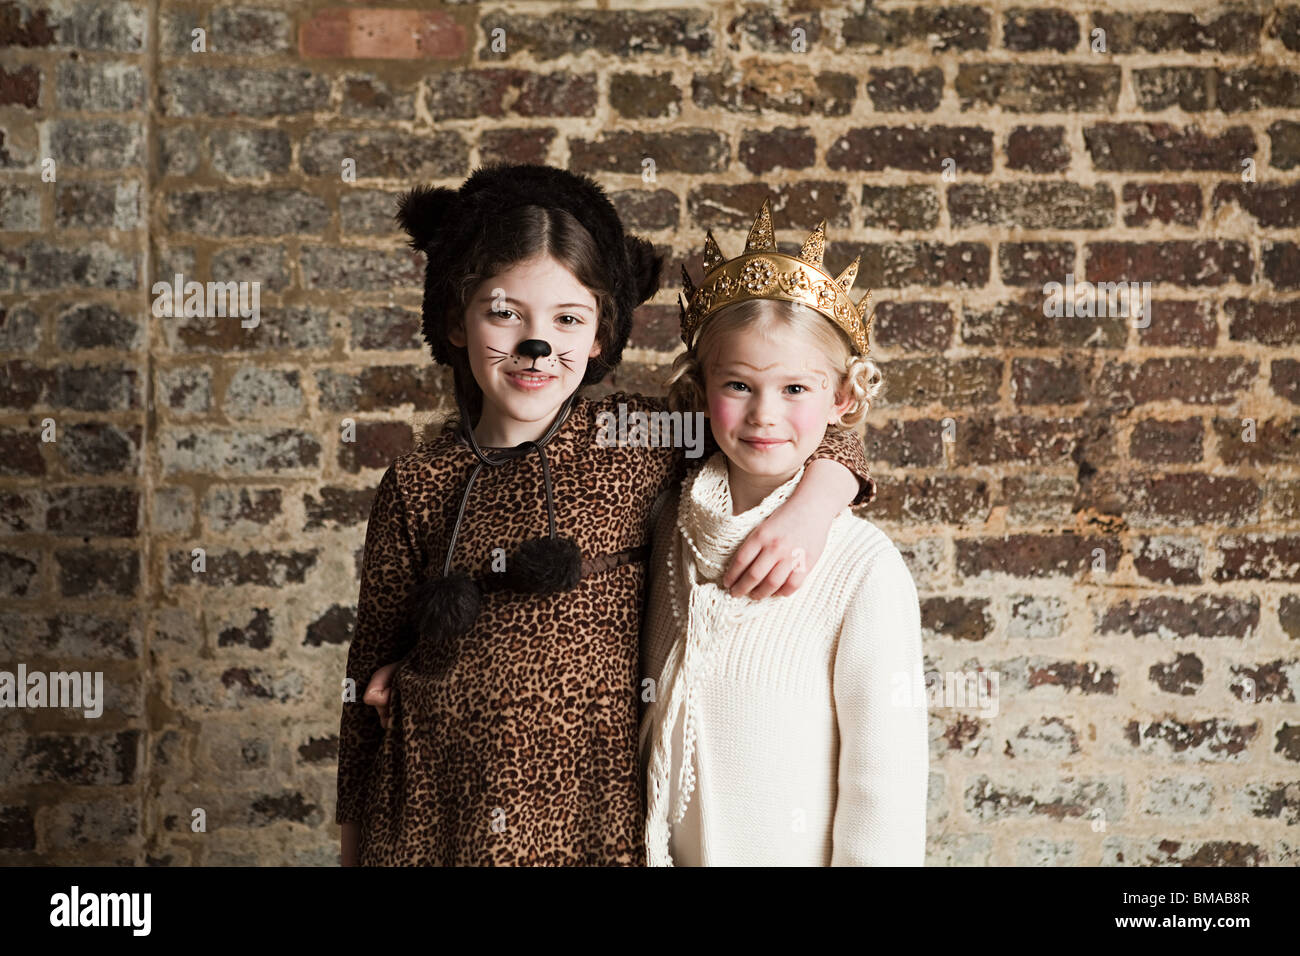 Cat Face Paint Stockfotos & Cat Face Paint Bilder - Alamy